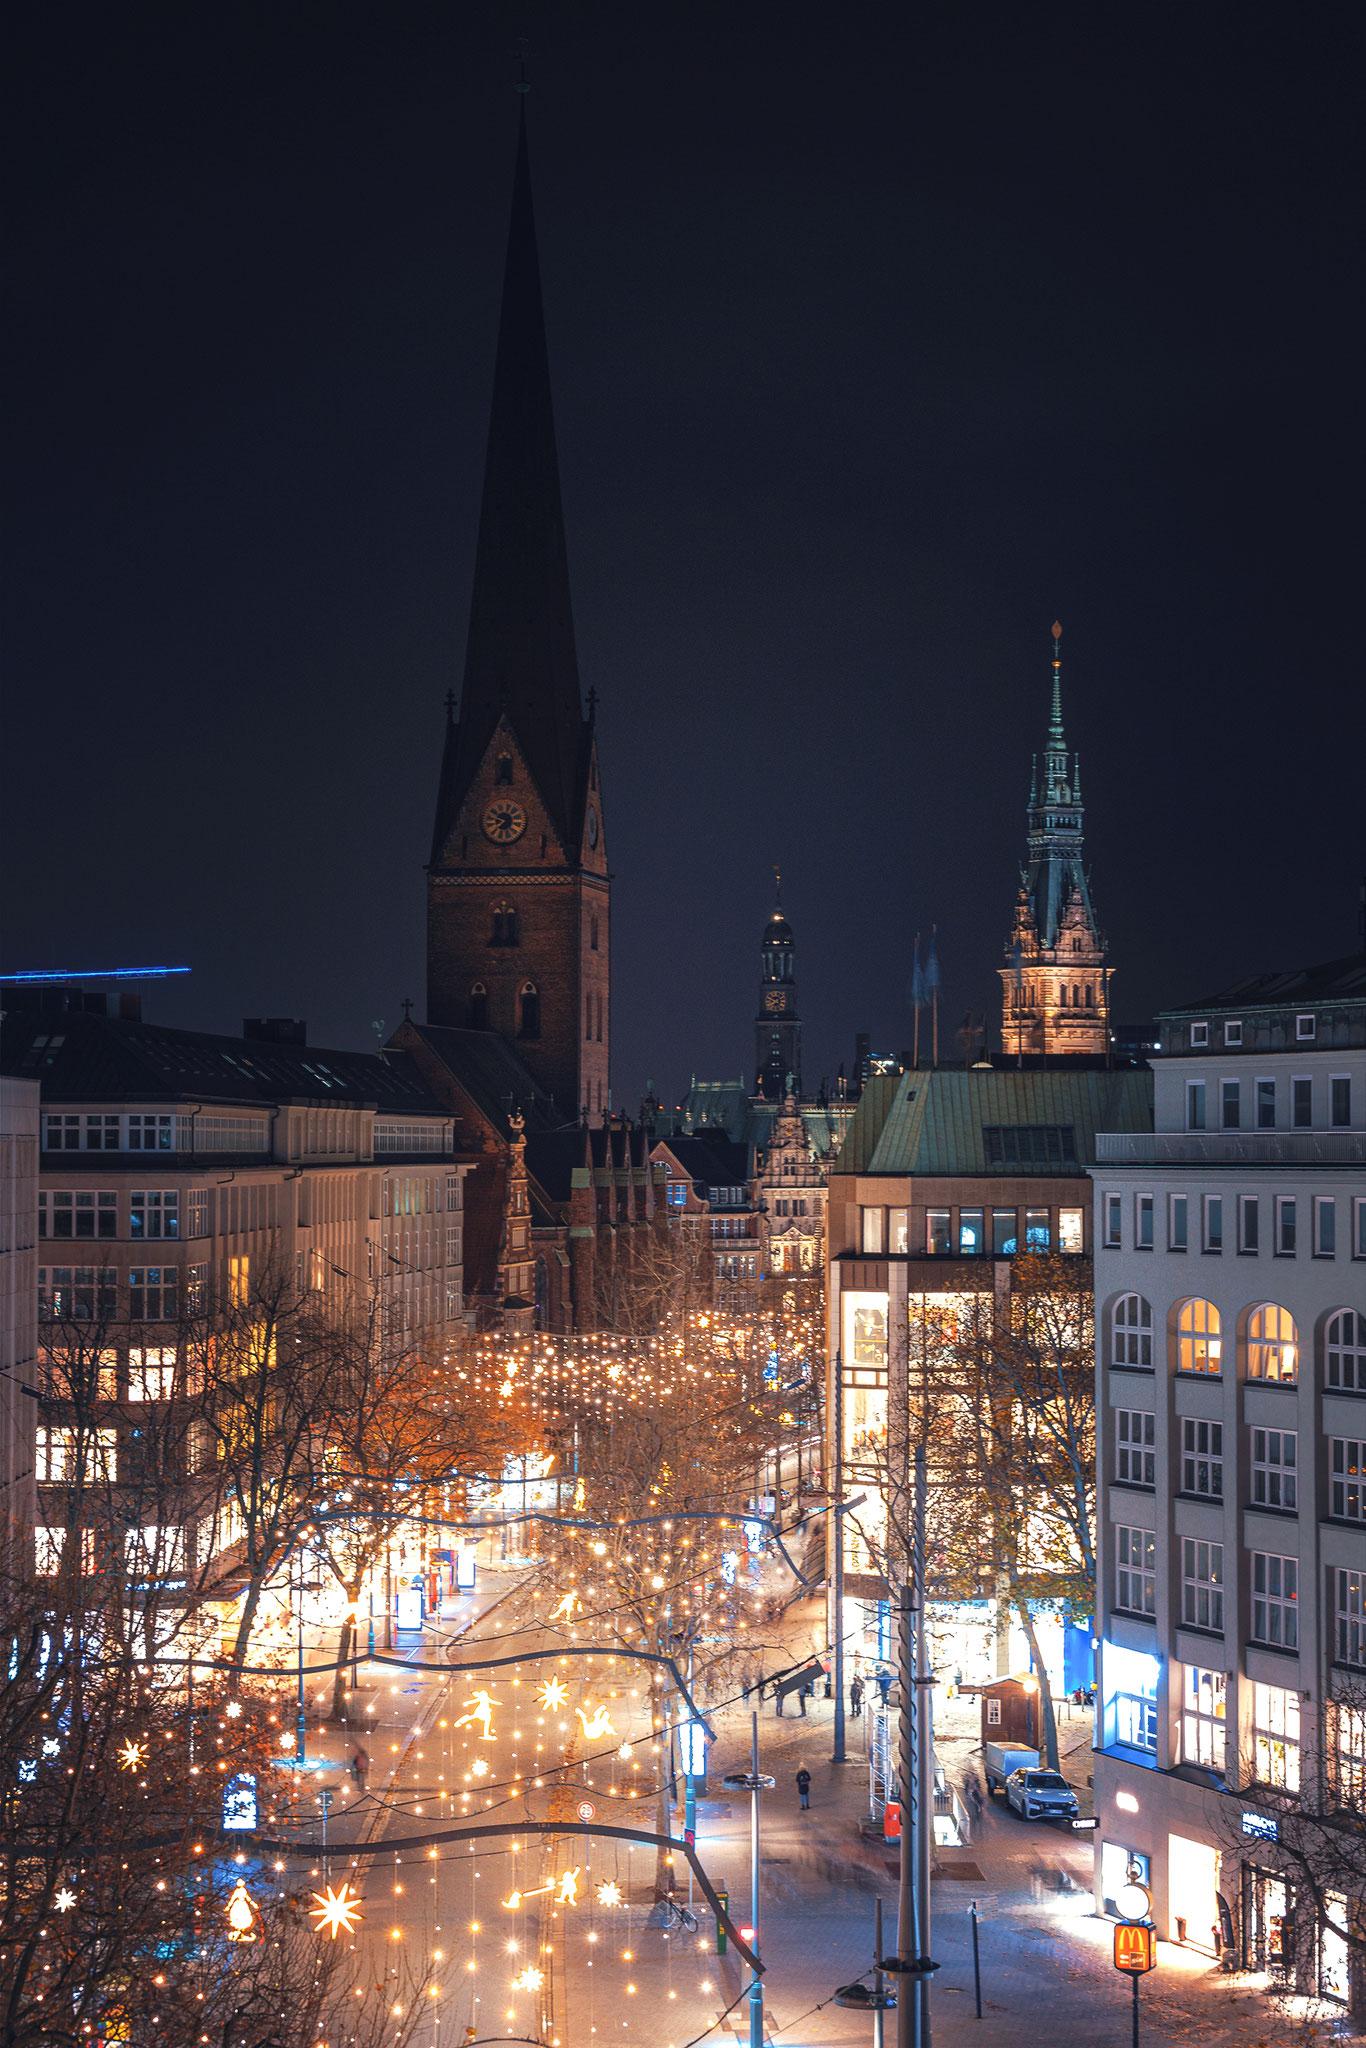 Foto Otto Wulff BID/Matthias Plander